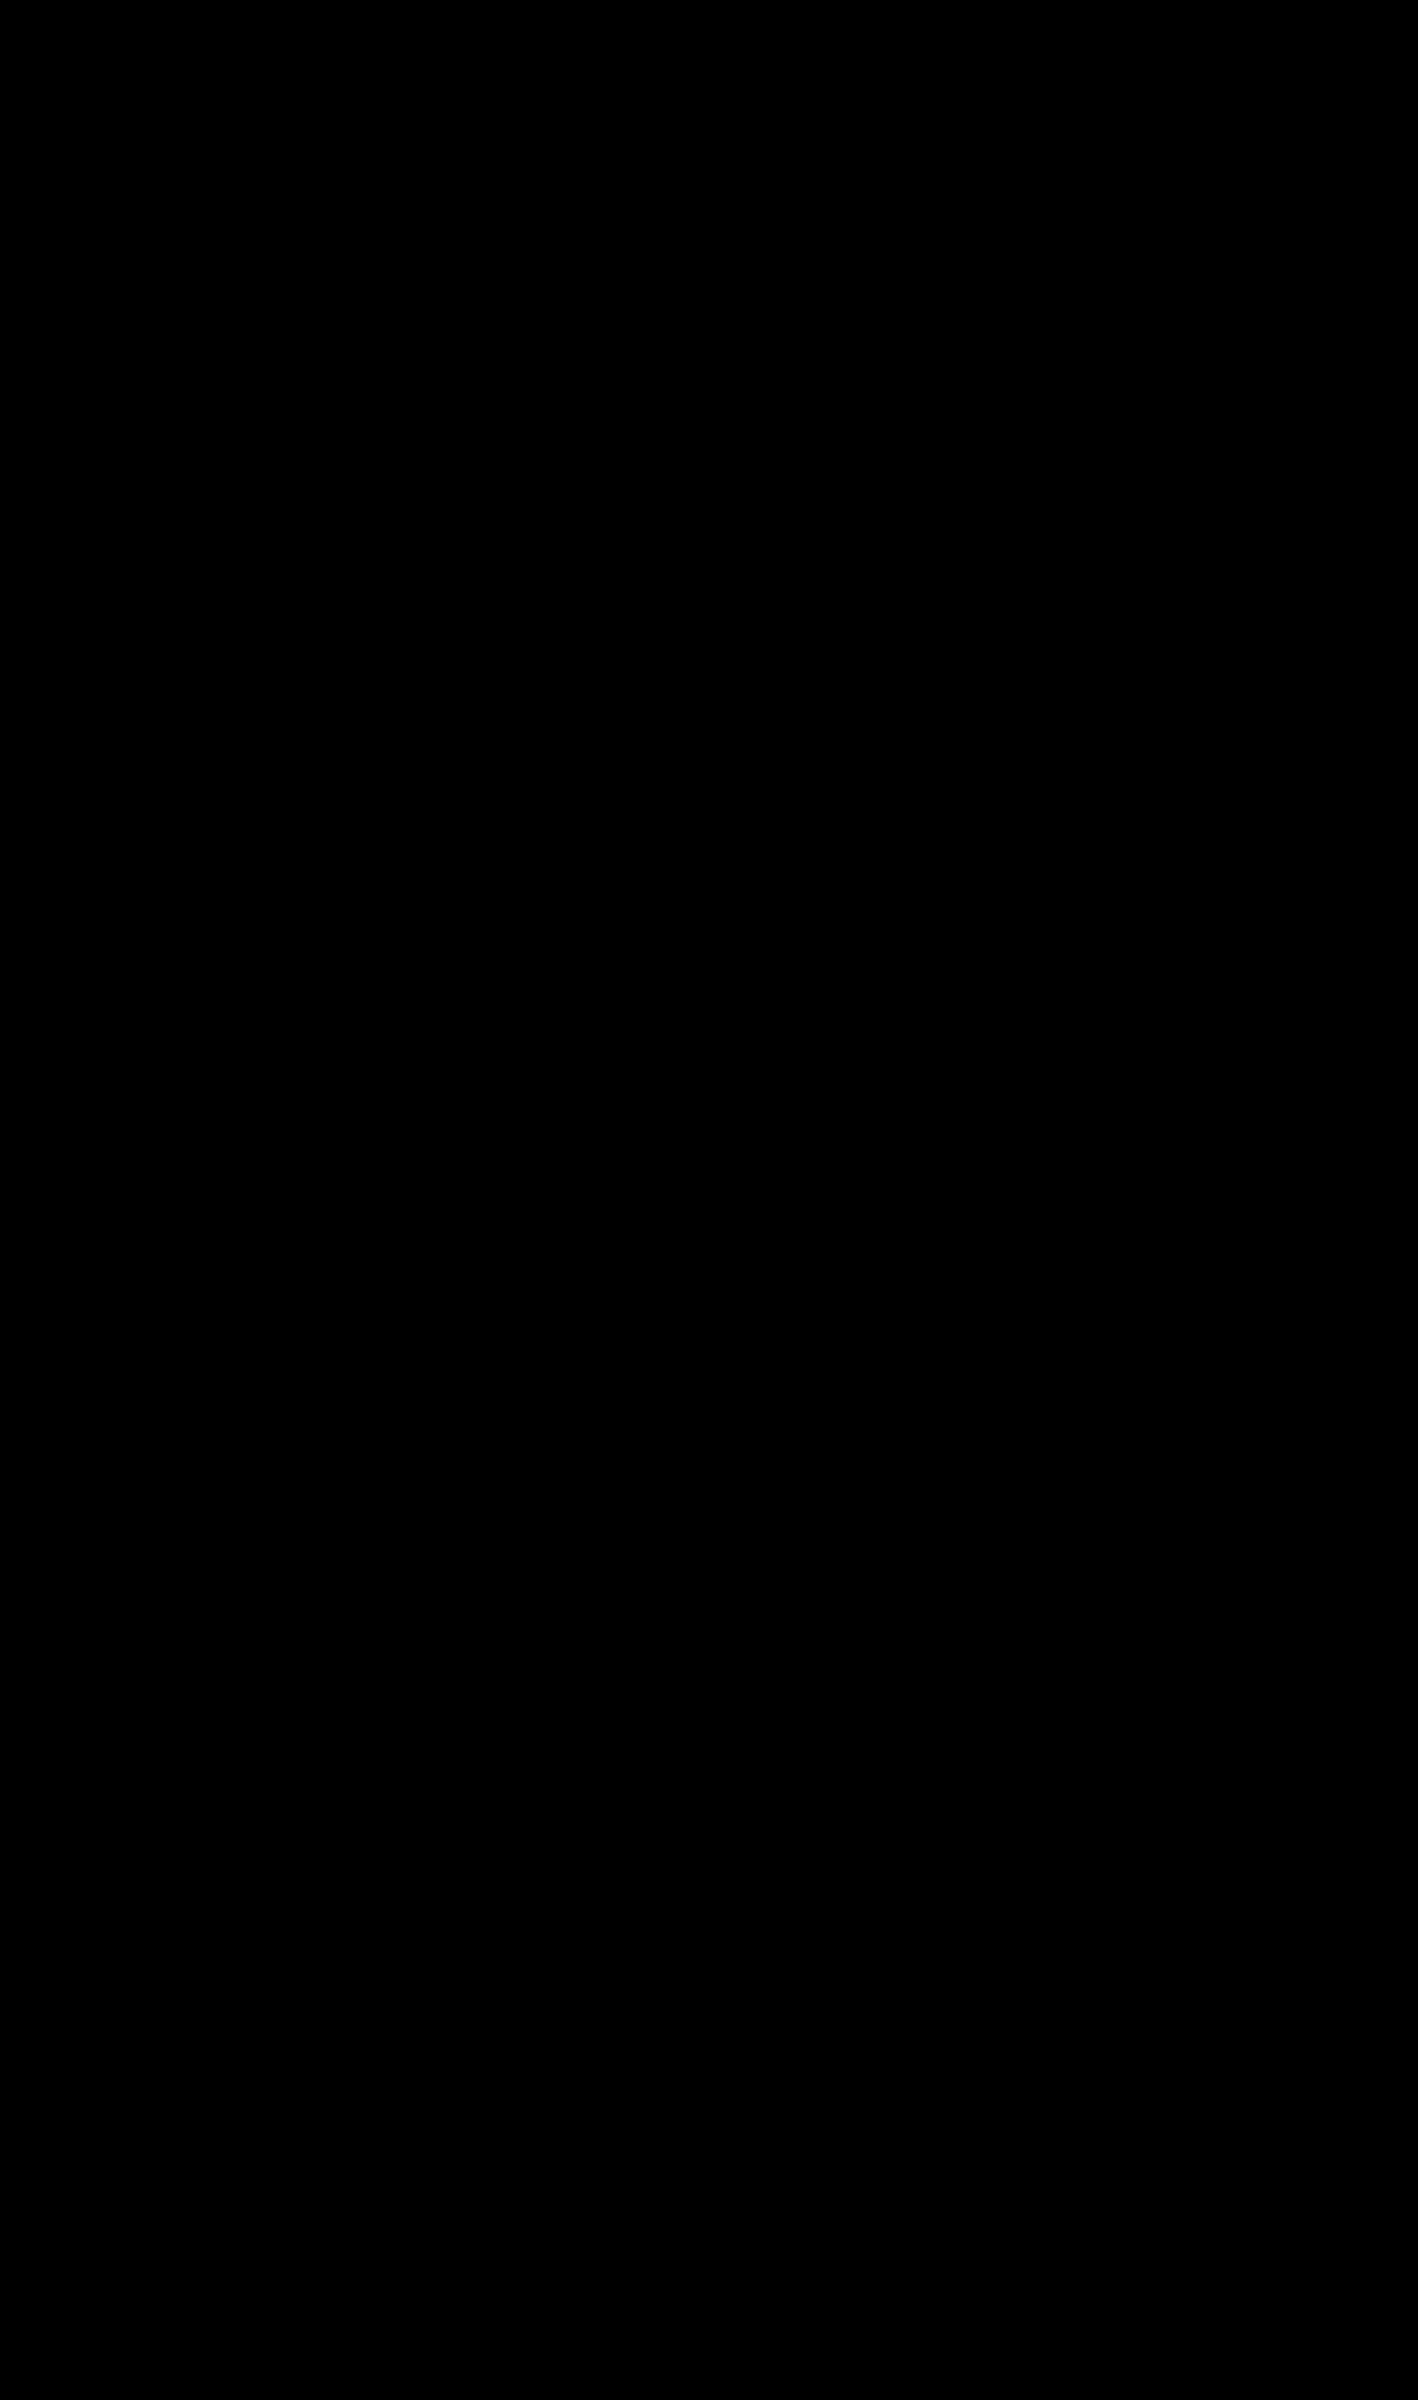 scifi-robothelper-2400px